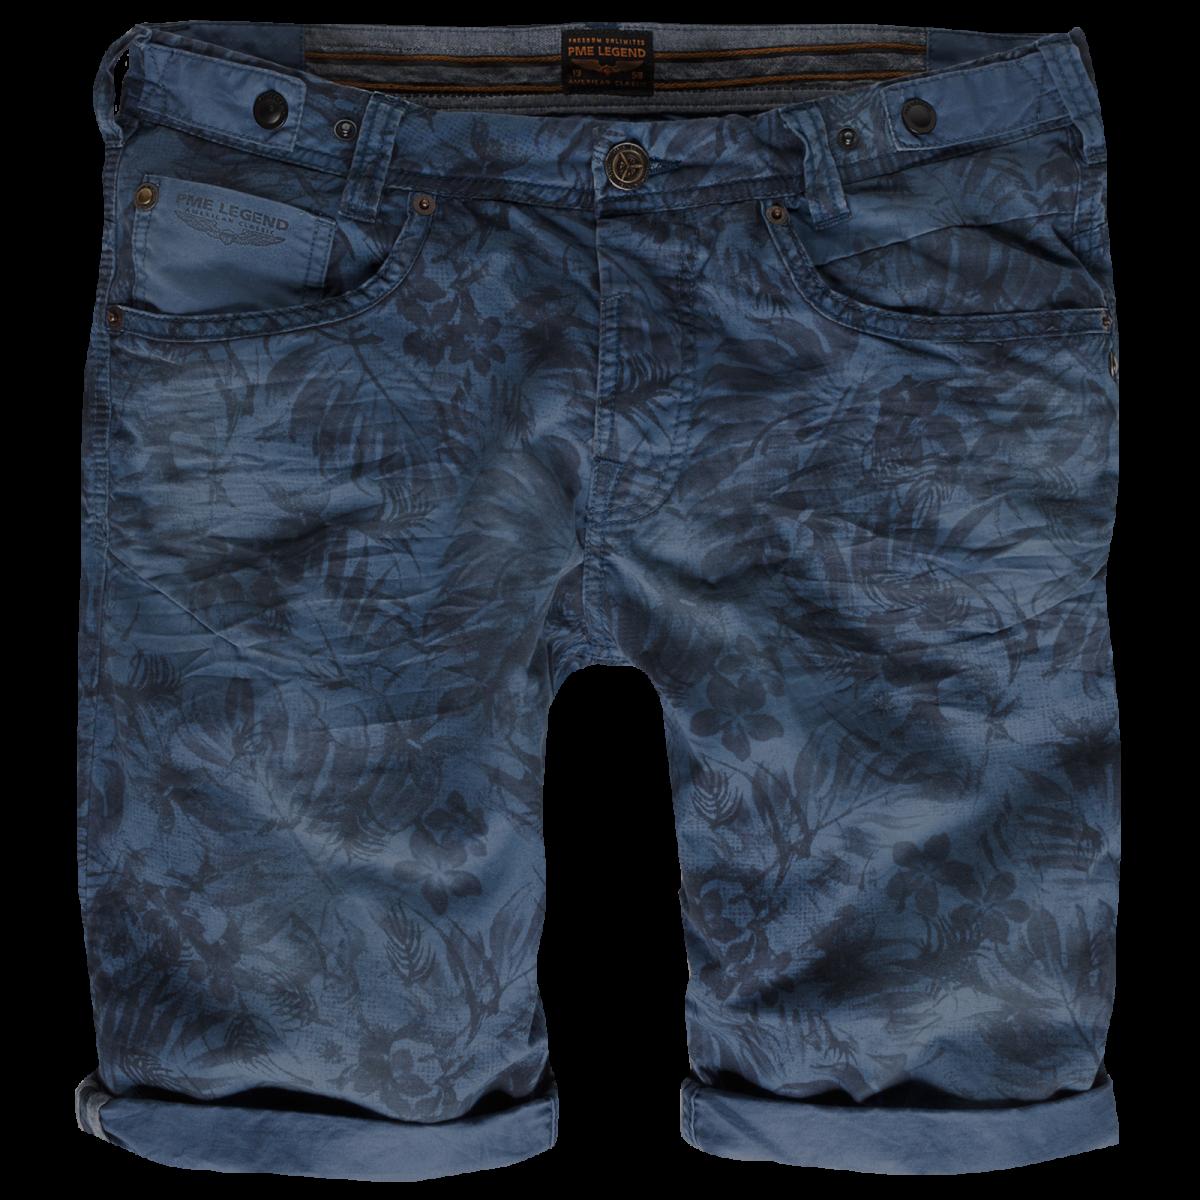 Pme Korte Broek Heren.Pme Legend Heren Short Heren Shorts Vj 2015 Bermuda Shorts